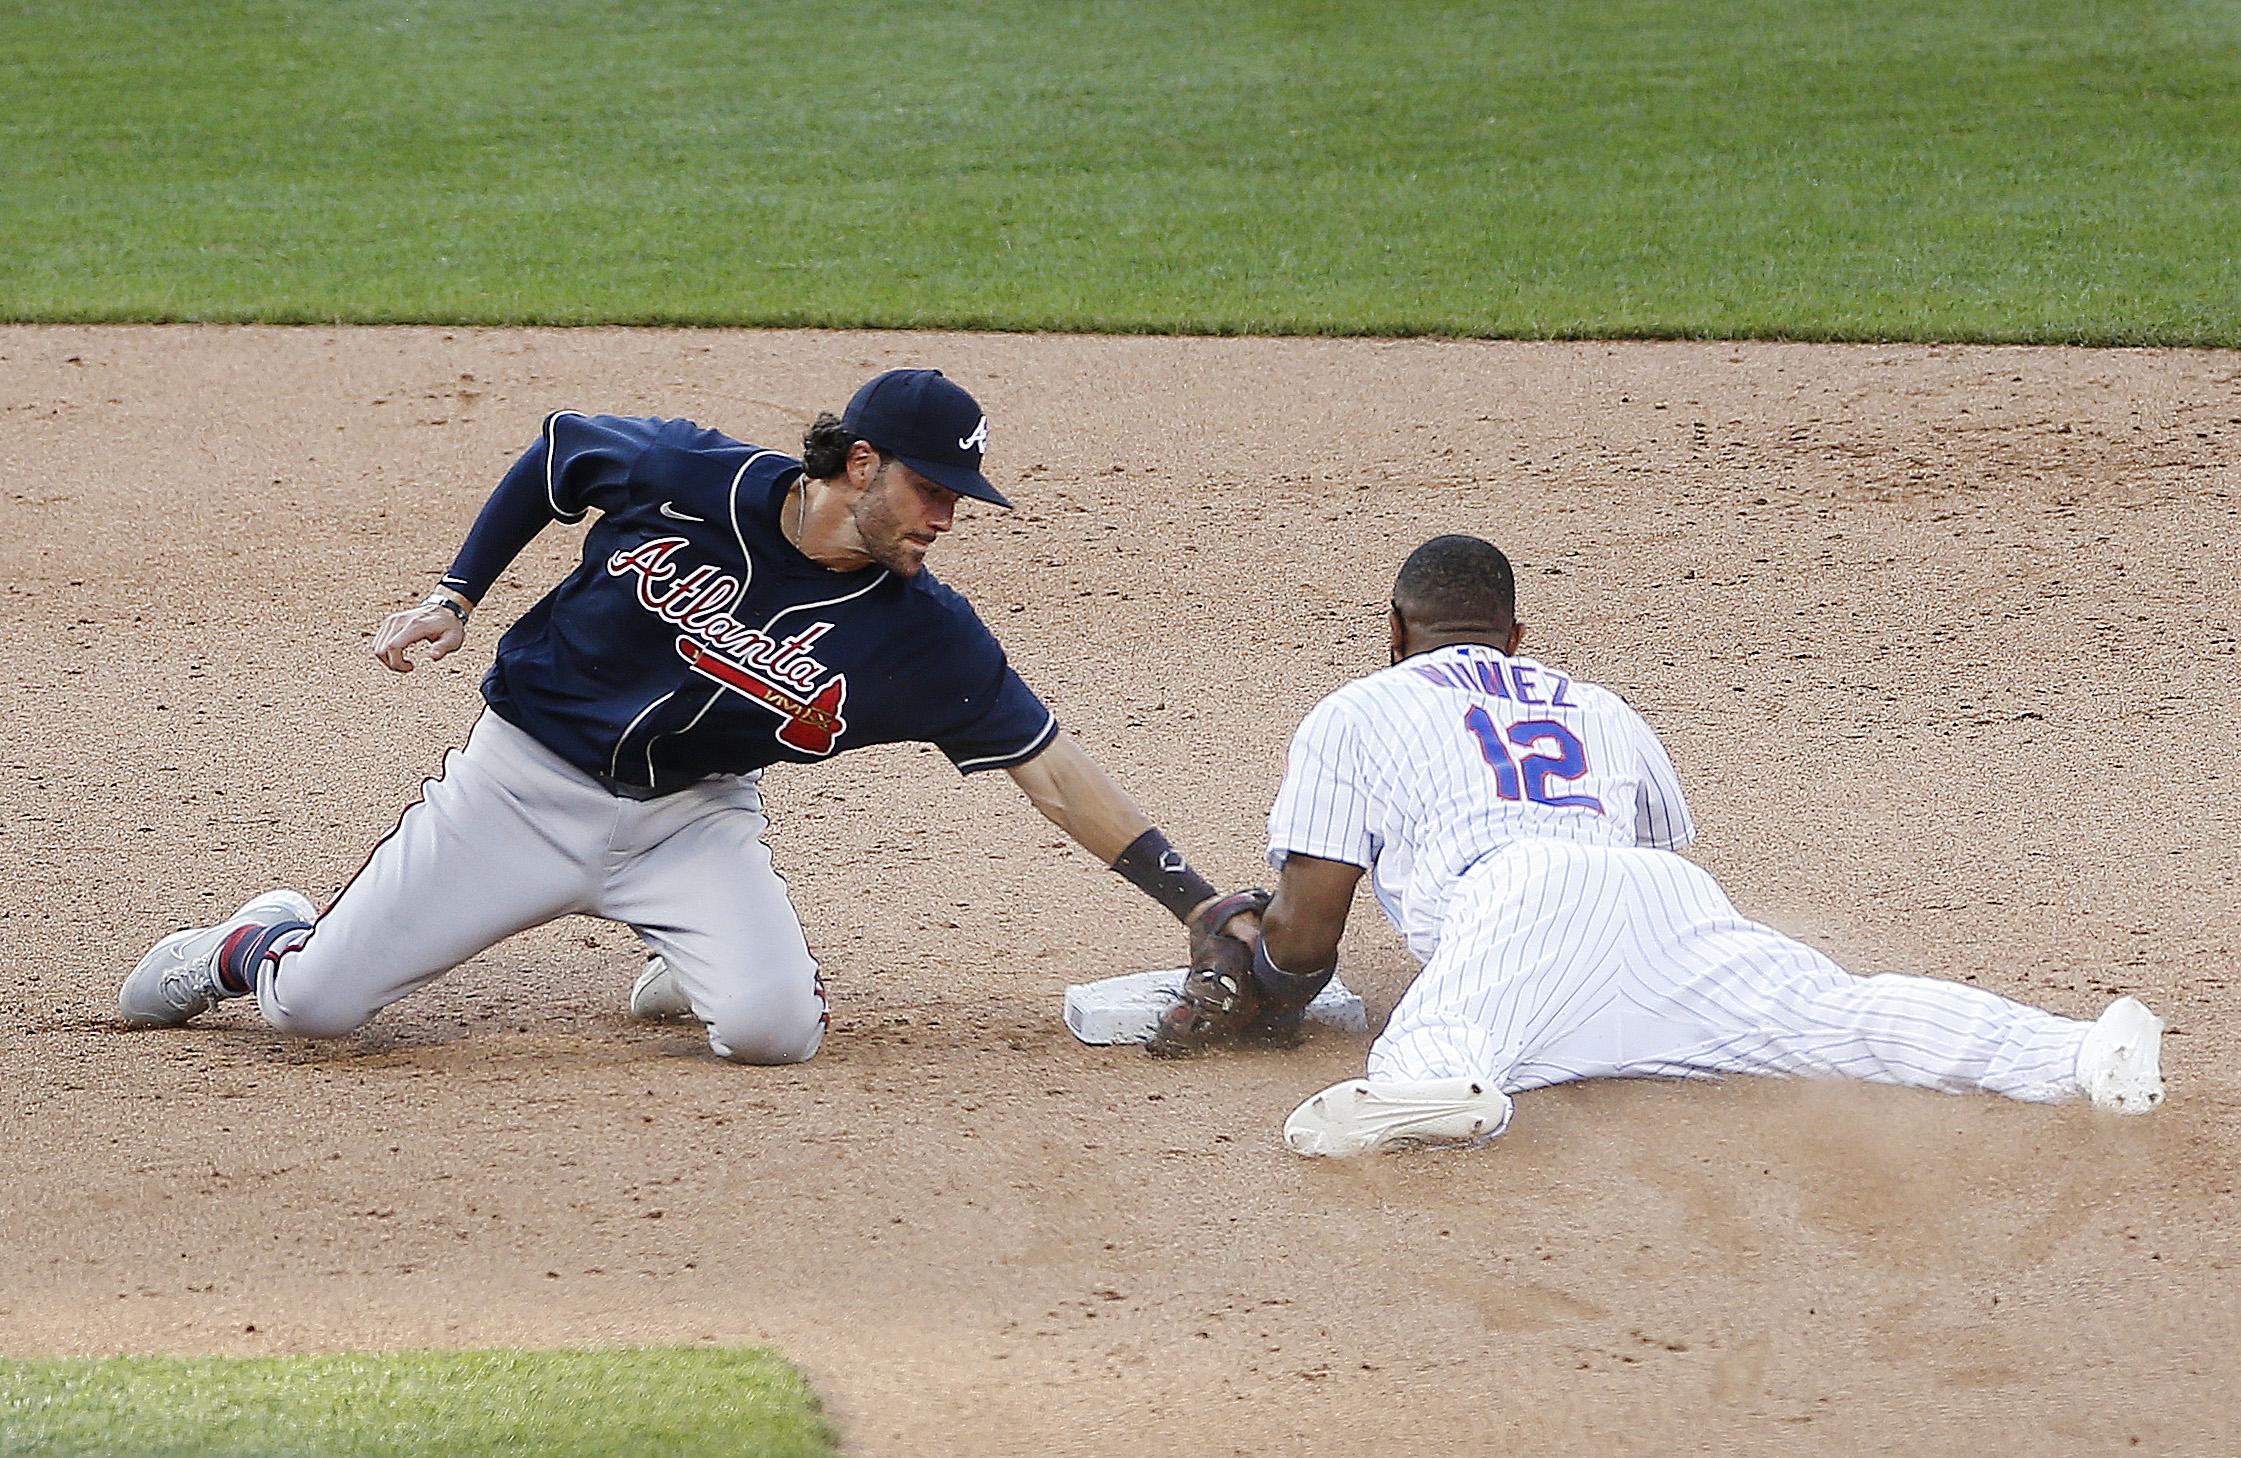 07/26/20 Game Preview: Atlanta Braves at New York Mets